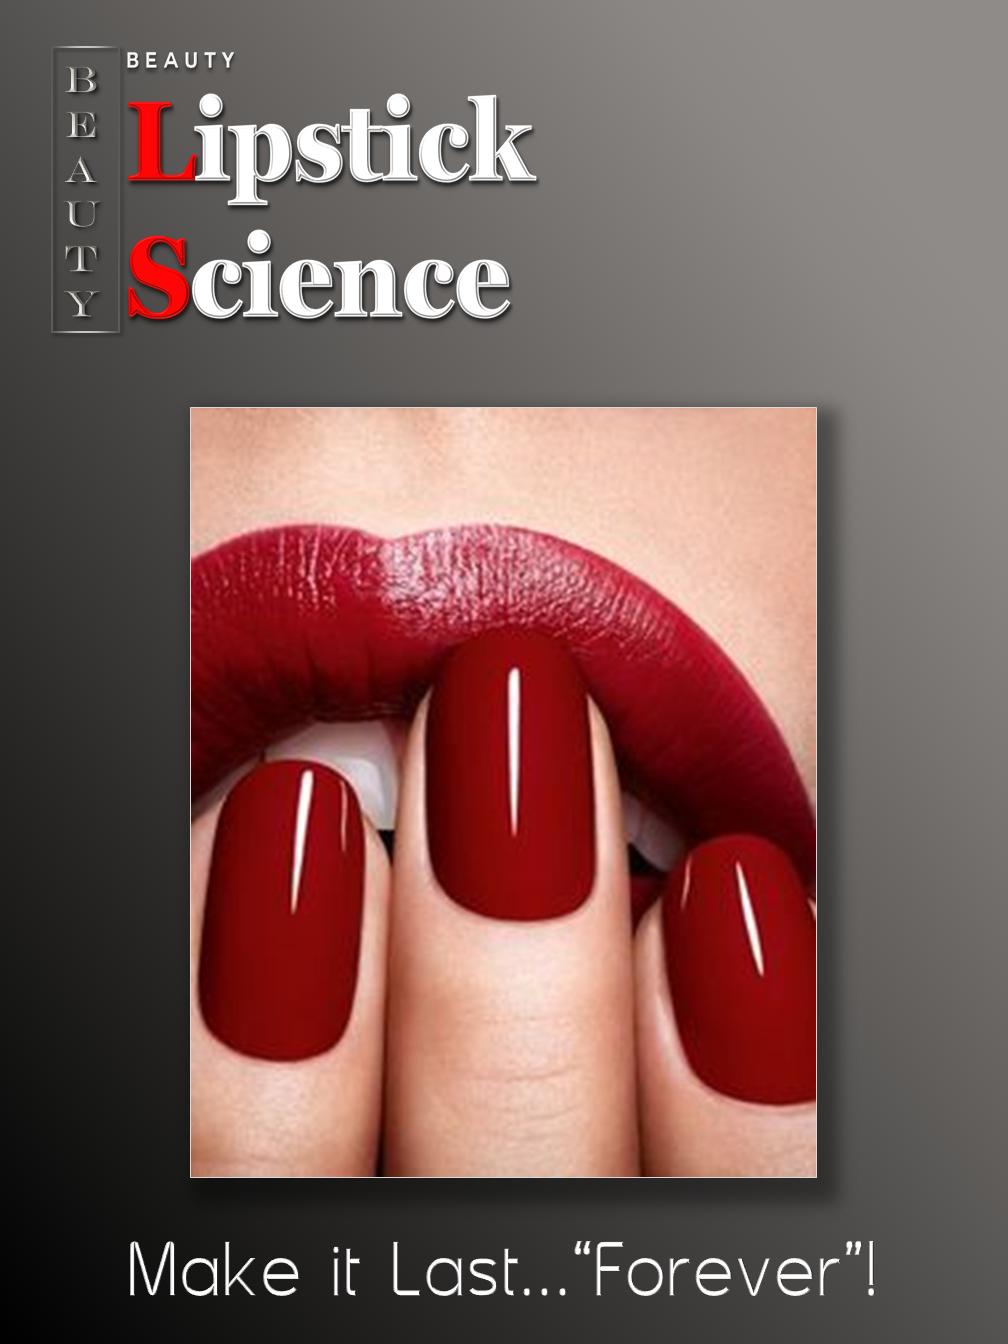 Lipstick Science